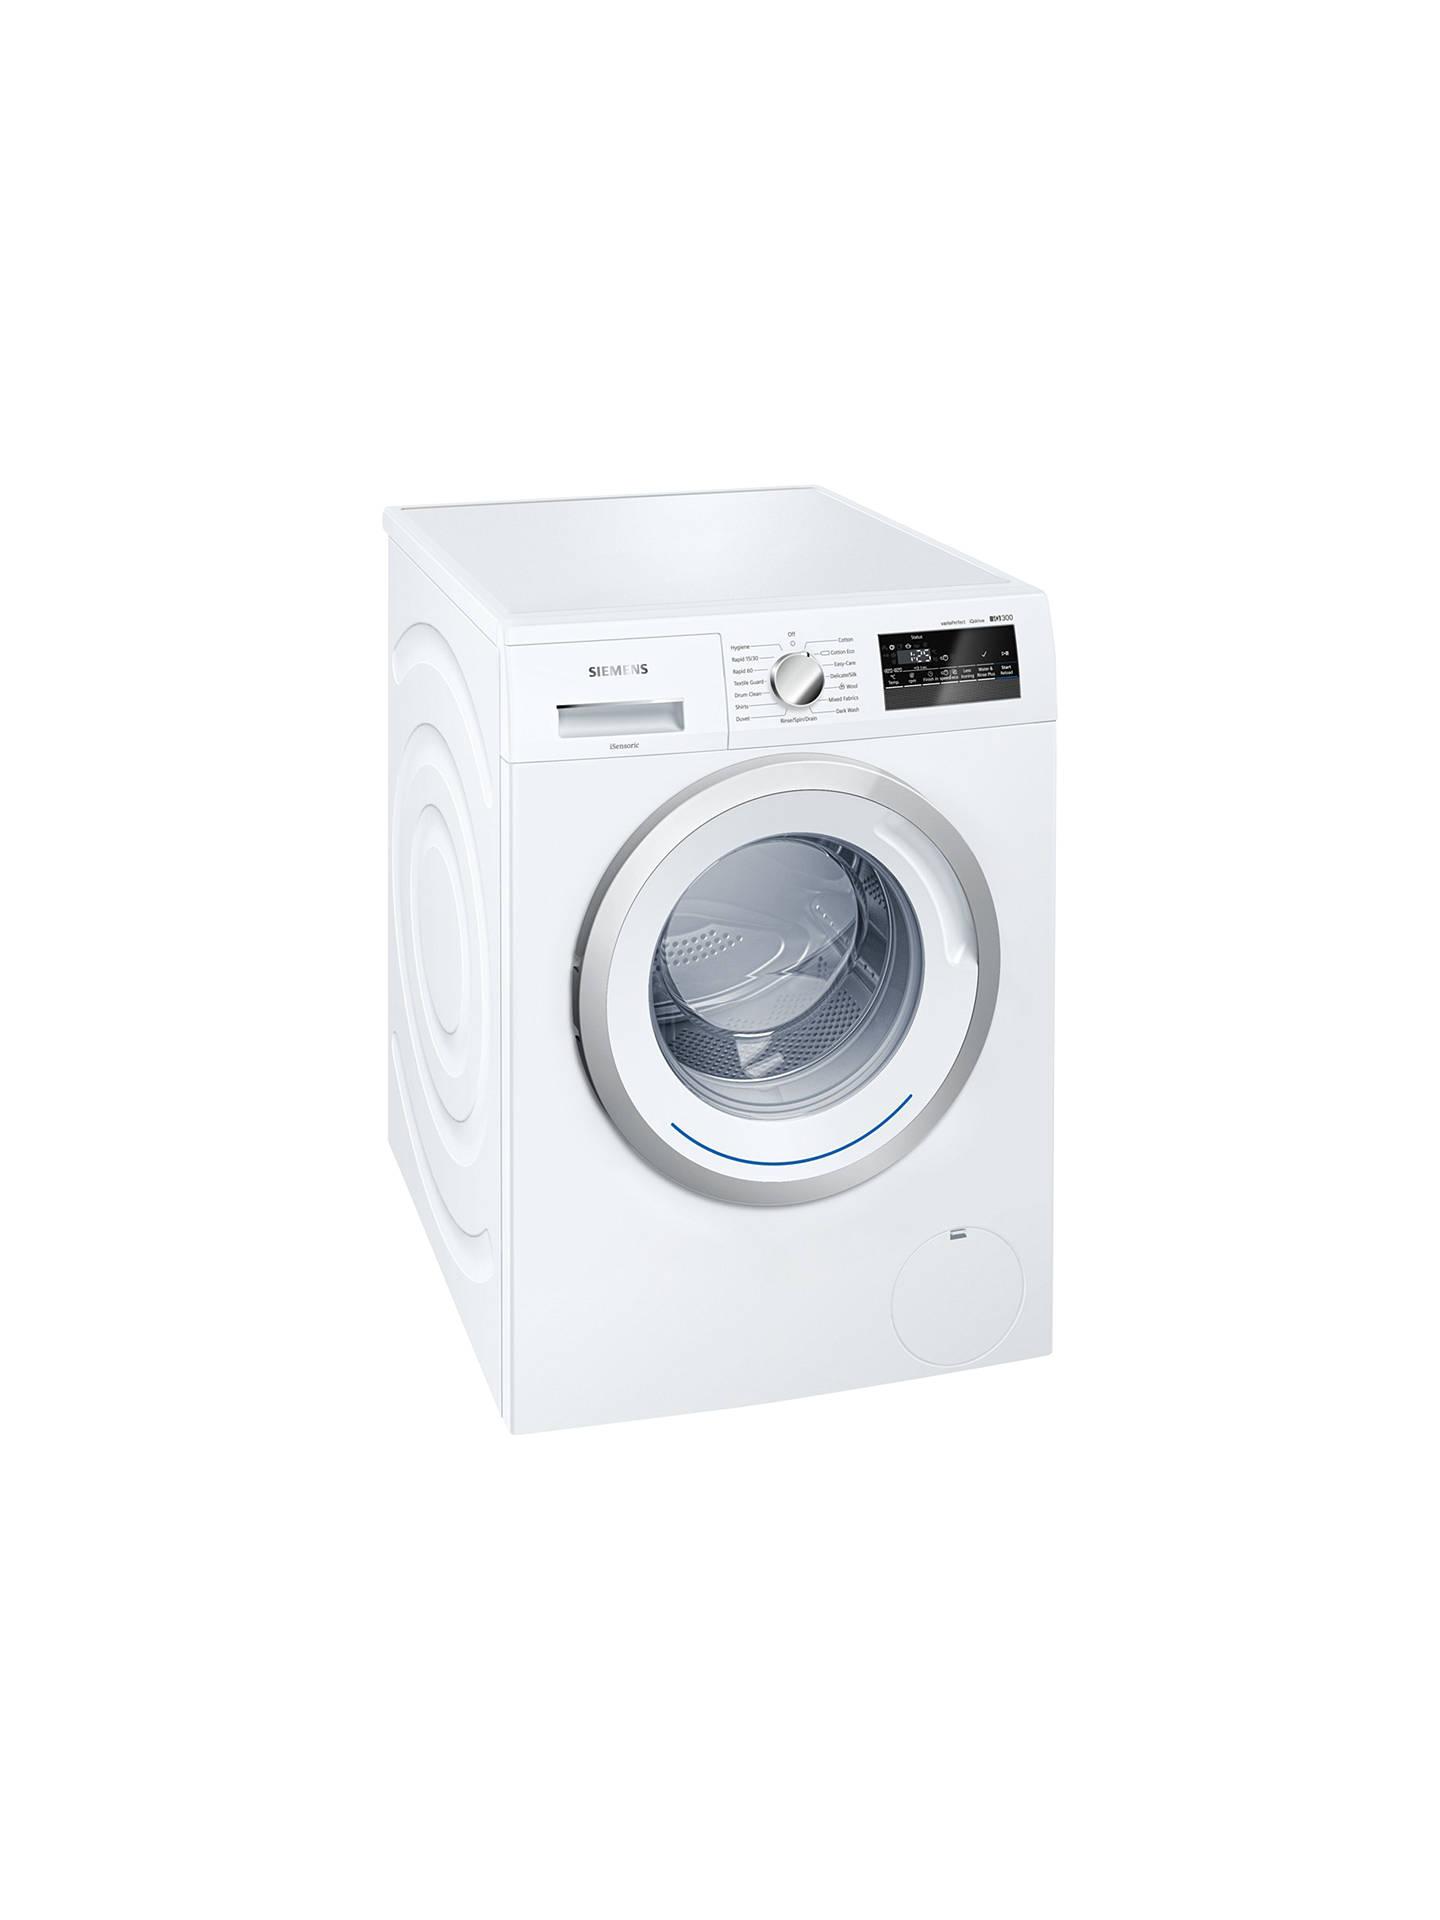 Siemens Iq300 Wm14n200gb Freestanding Washing Machine 8kg Load A